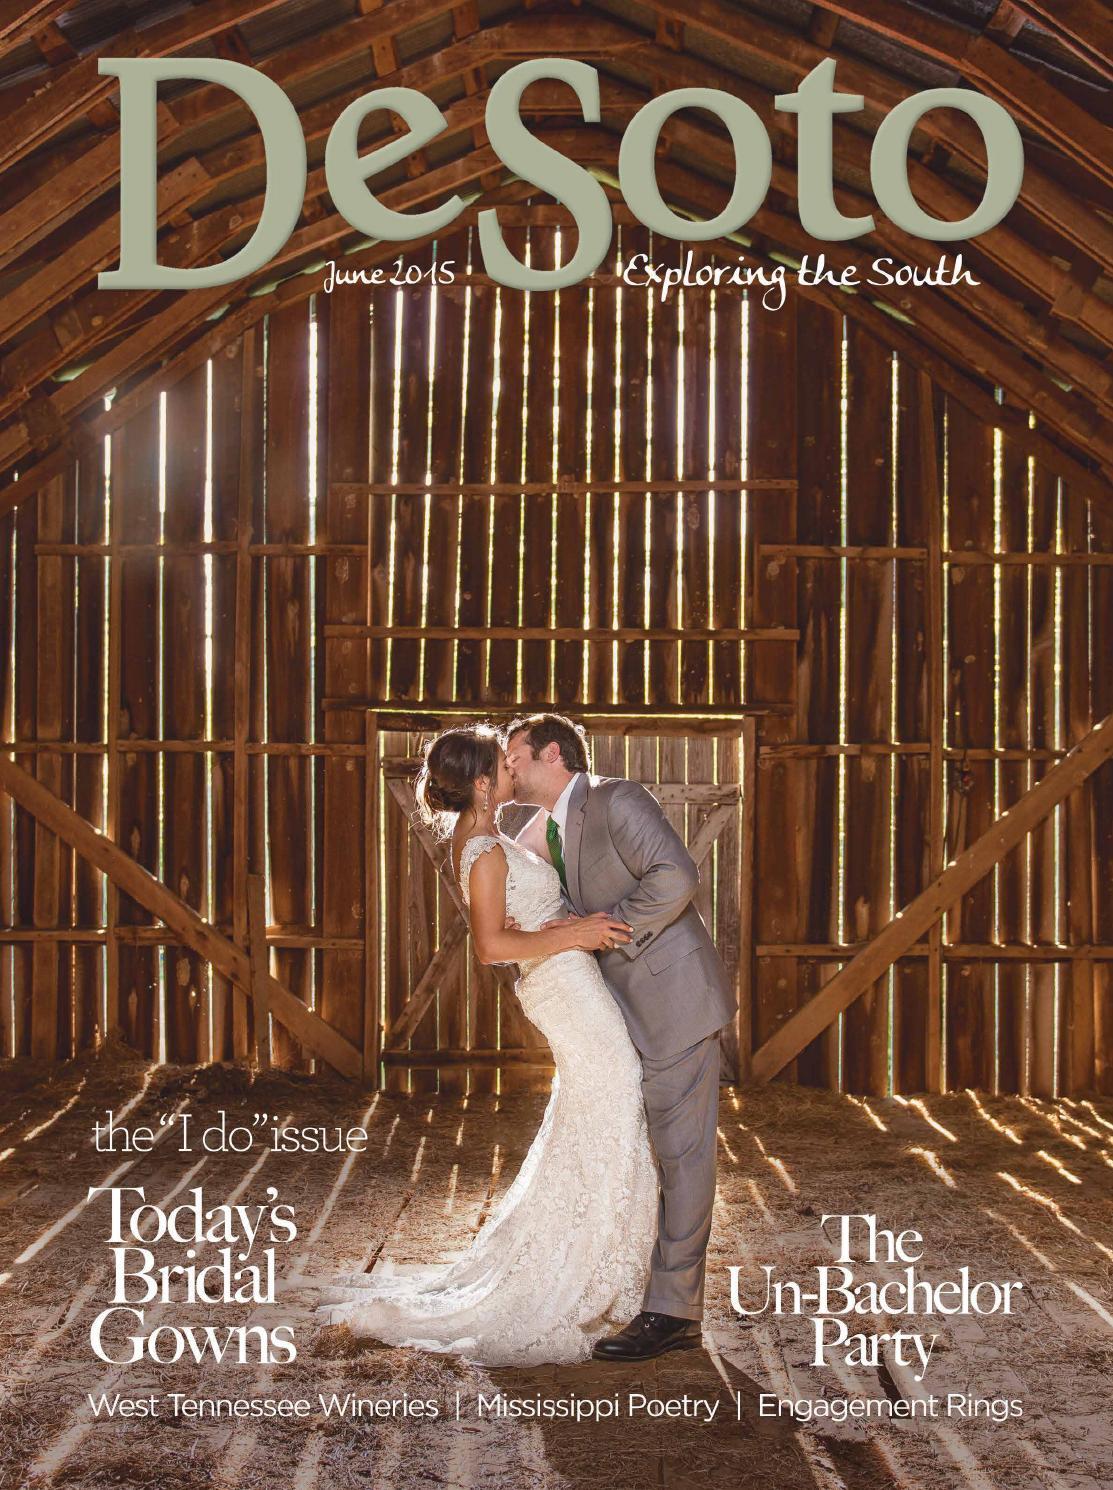 DeSoto Magazine June 2015 by DeSoto Magazine | Exploring the South ...